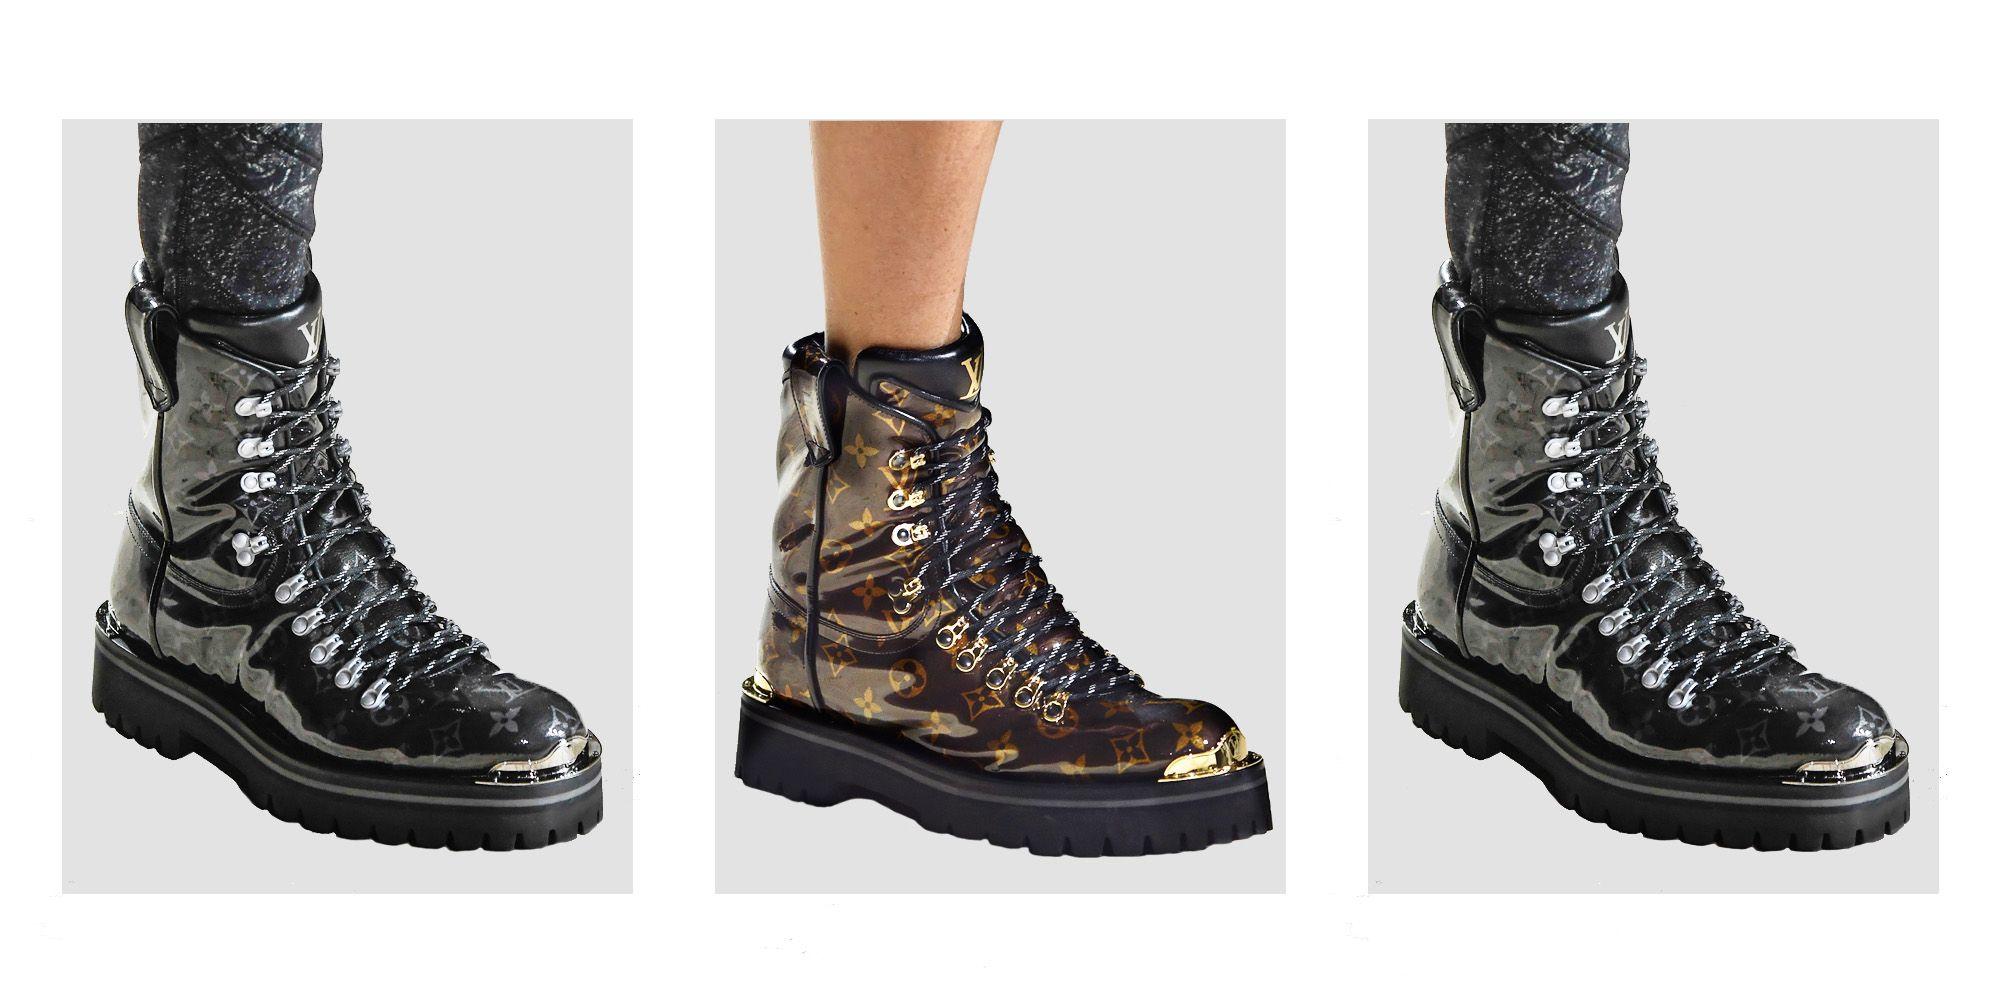 Louis Vuitton Hiking Boots Kim Jones Vuitton